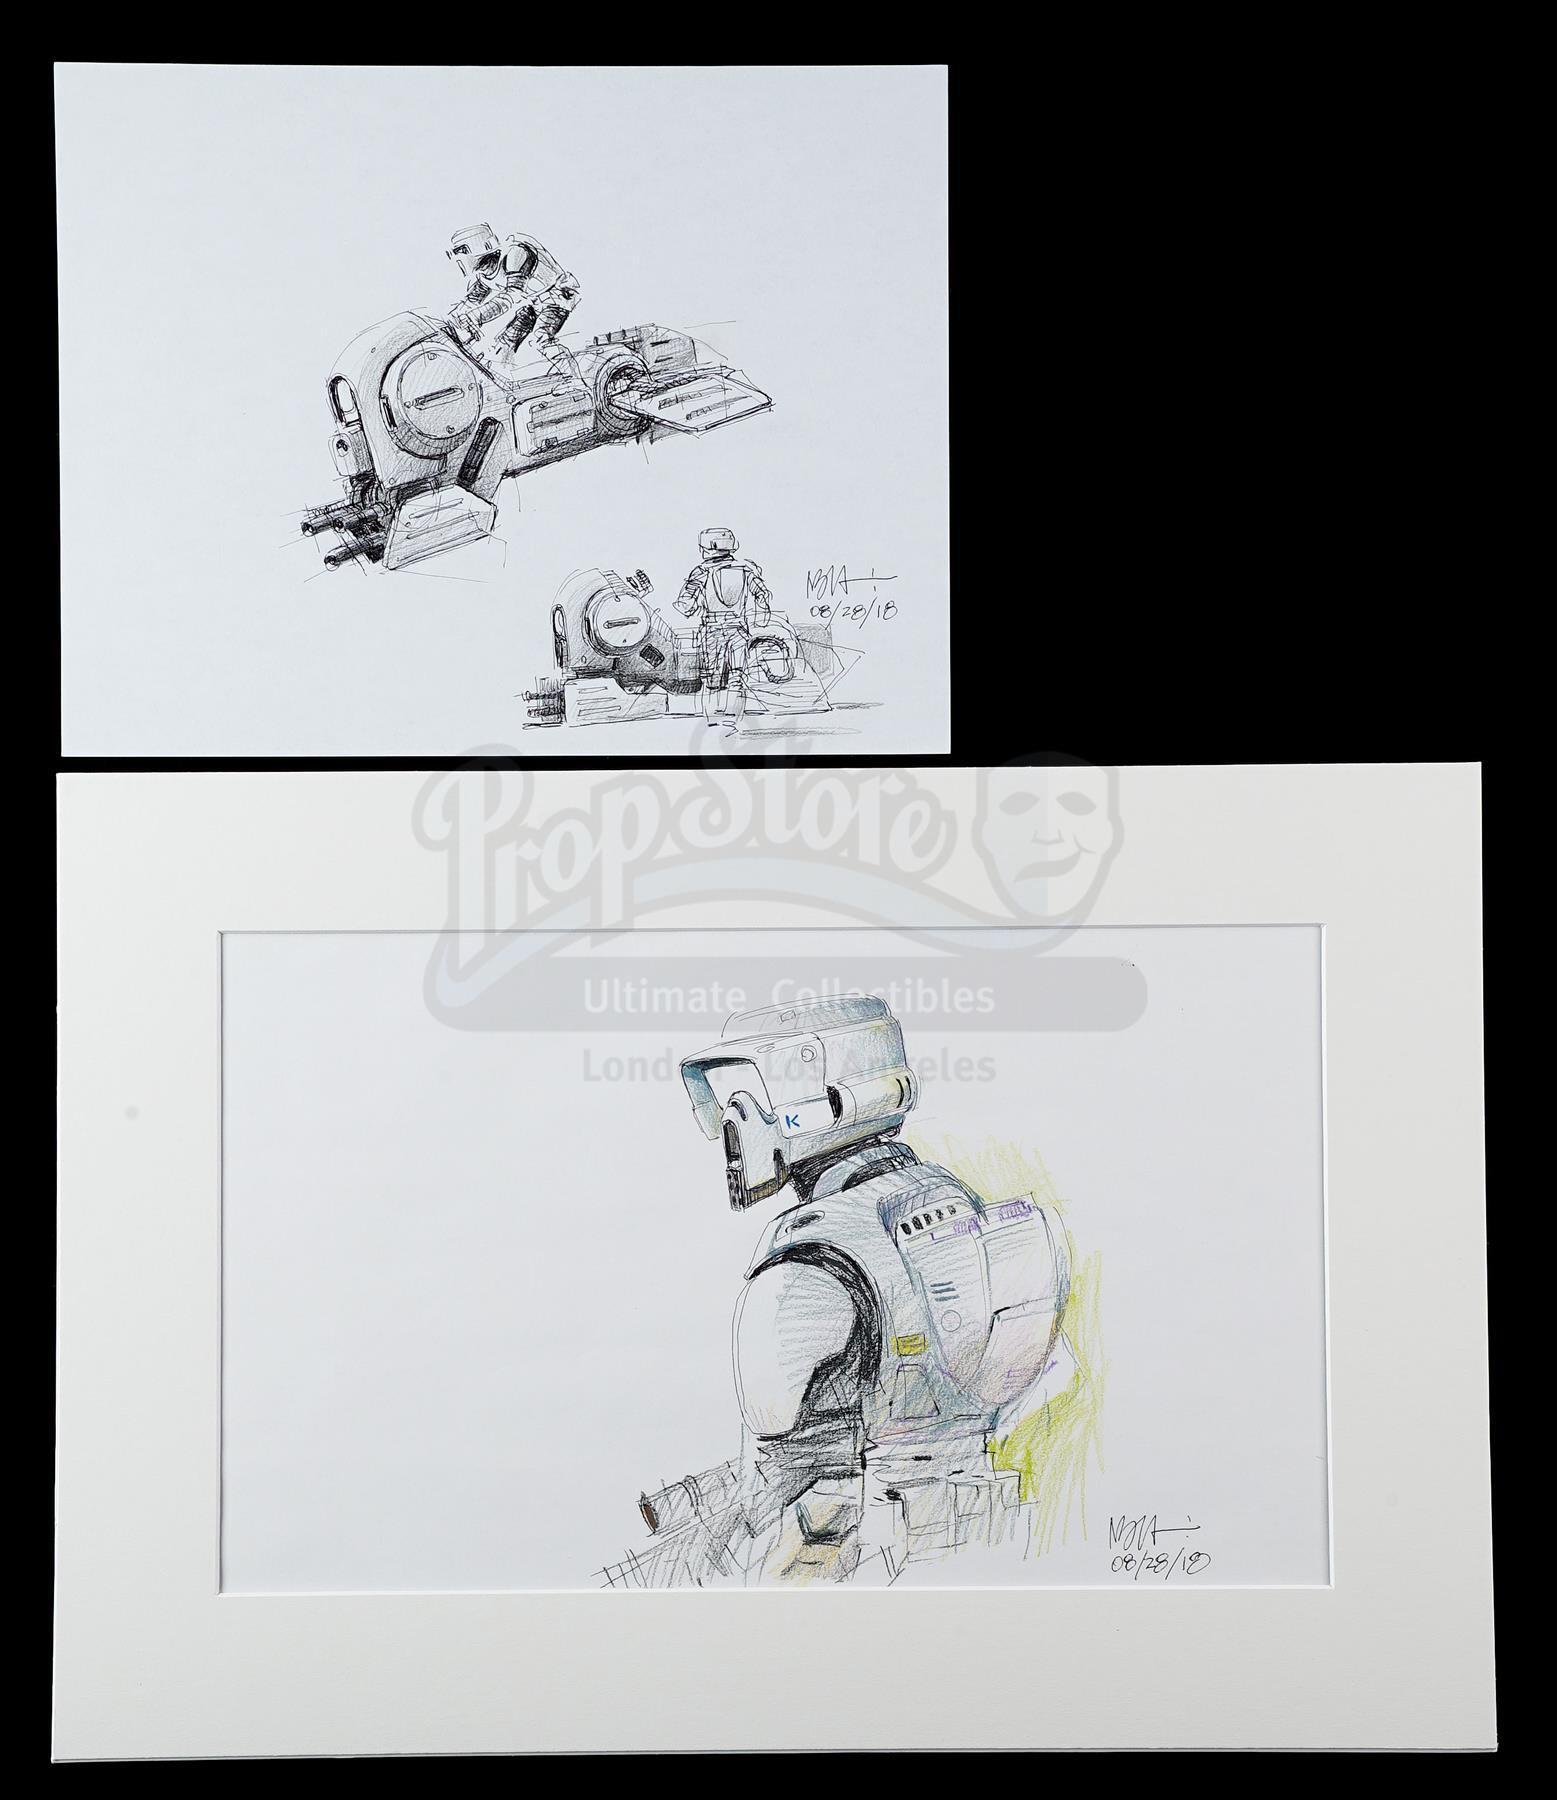 Lot # 1186: STAR WARS - EP VI - RETURN OF THE JEDI - Alternate Speeder Bike and Biker Scout Sketches